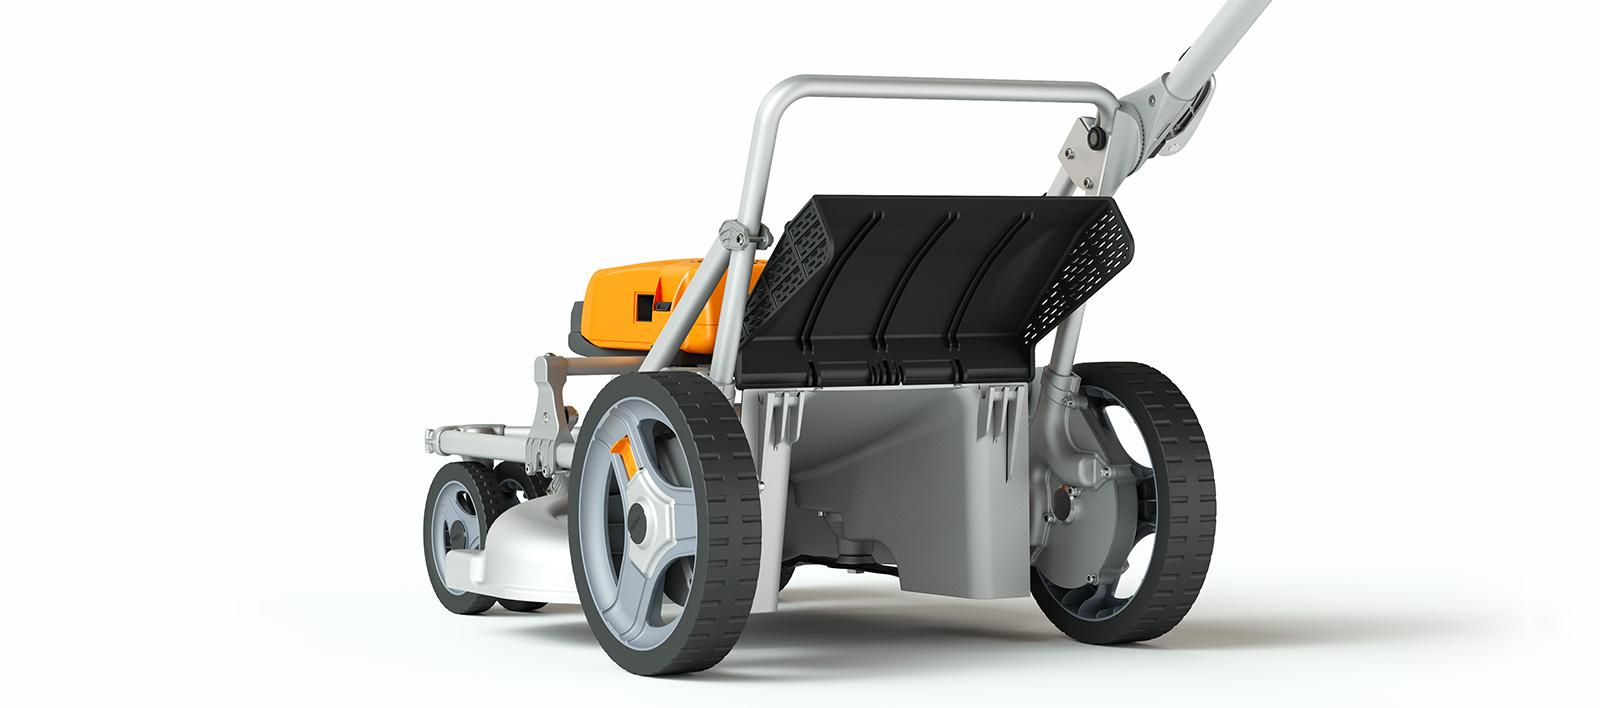 Pellenc-Tondeuse-Rasion-Basic-Debourrage-Automatique